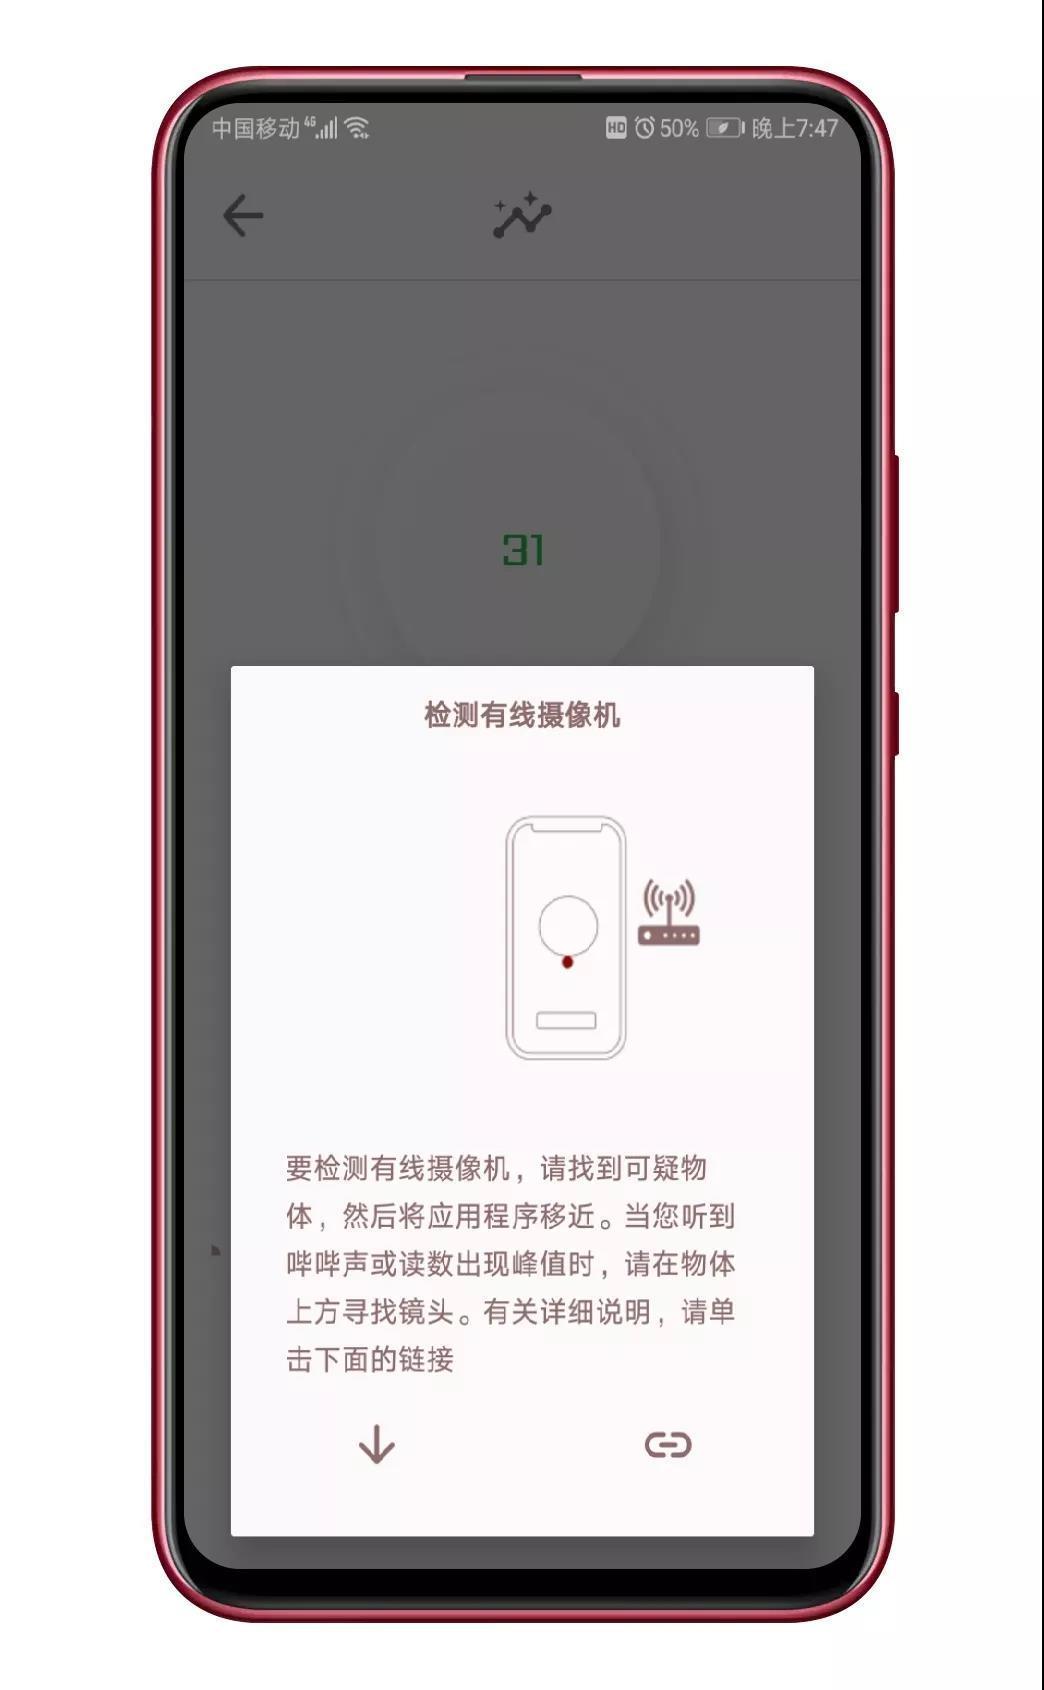 6109fa795132923bf84bb11a 可以检测酒店房间摄像头的软件--隐藏式摄像机探测Pro